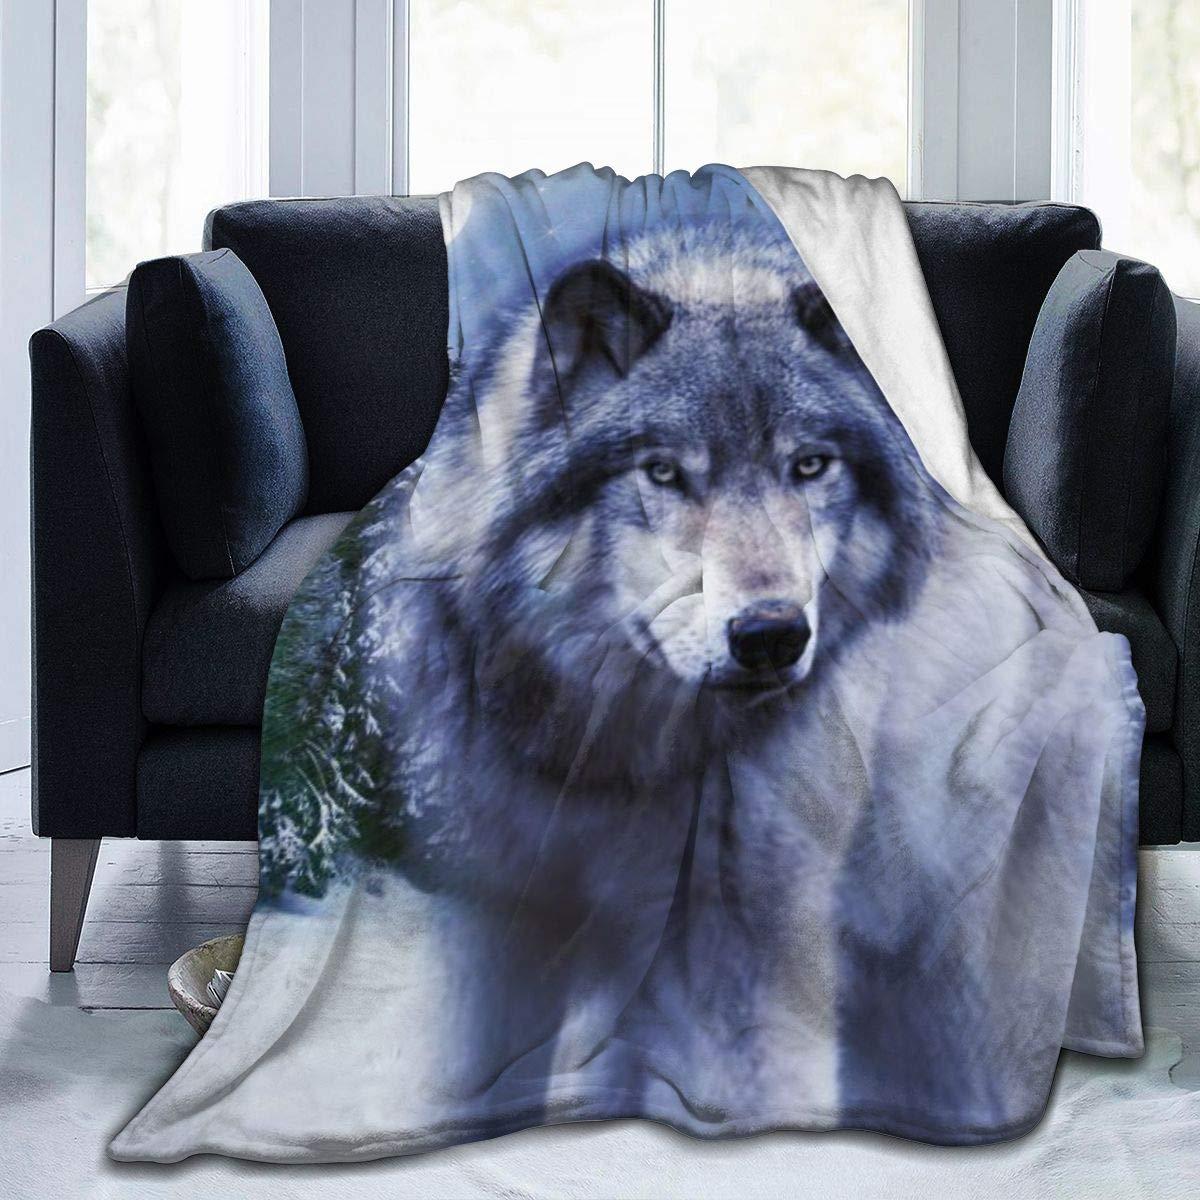 Wolf Ultra-Soft Micro Fleece Flannel Blanket Cozy Warm Blankets Throw Bed Blanket for All Season